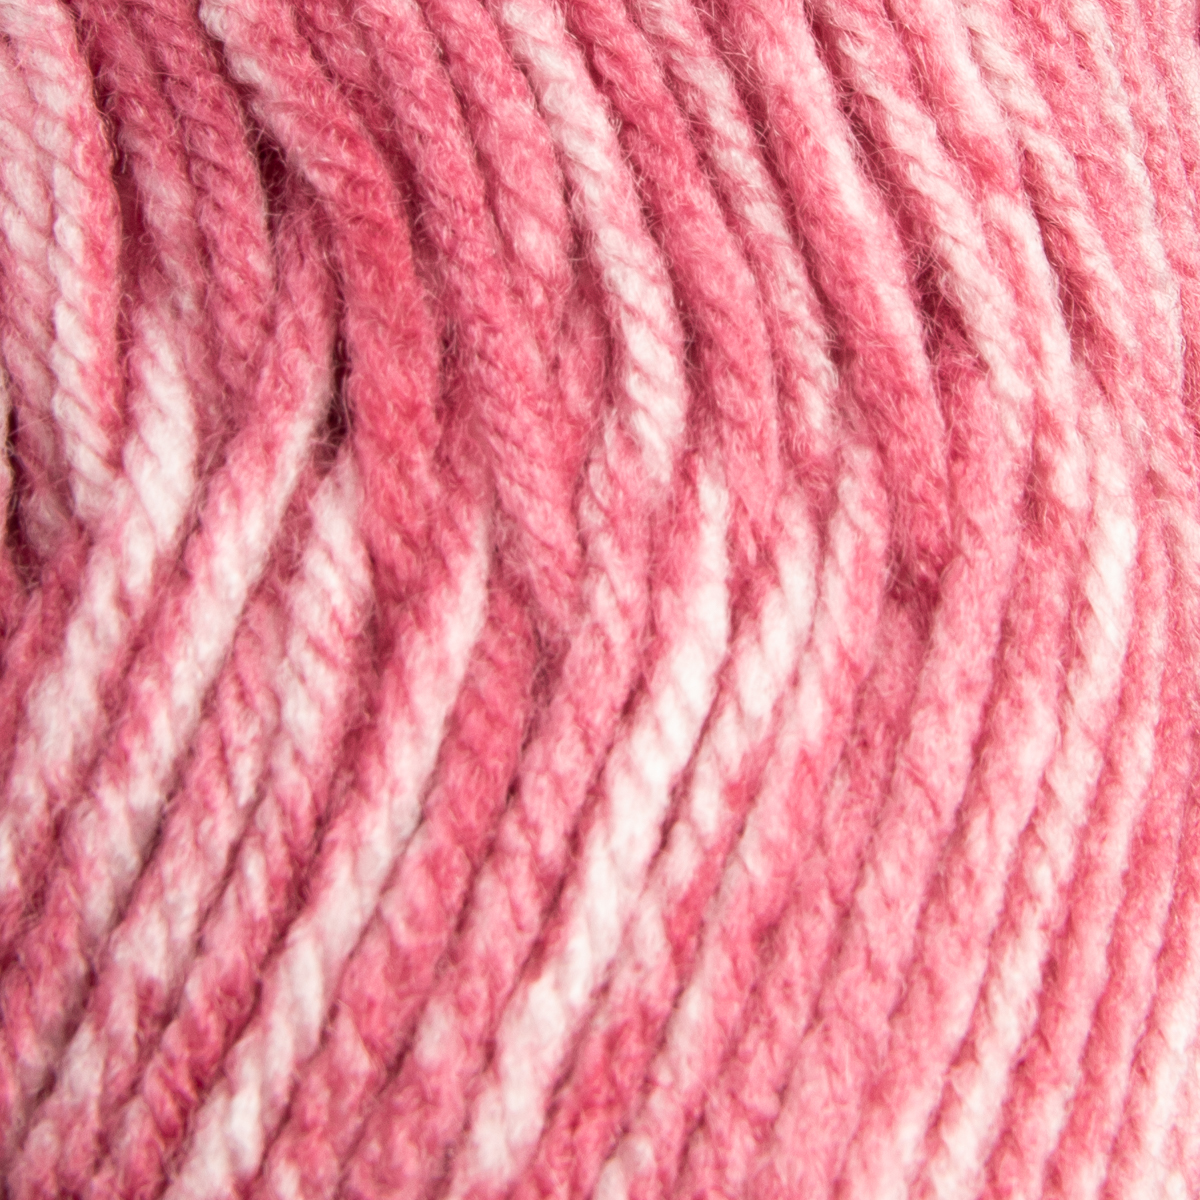 3pk-Lion-Brand-Vanna-s-Choice-100-Acrylic-Yarn-Medium-4-Knitting-Skeins-Soft thumbnail 57